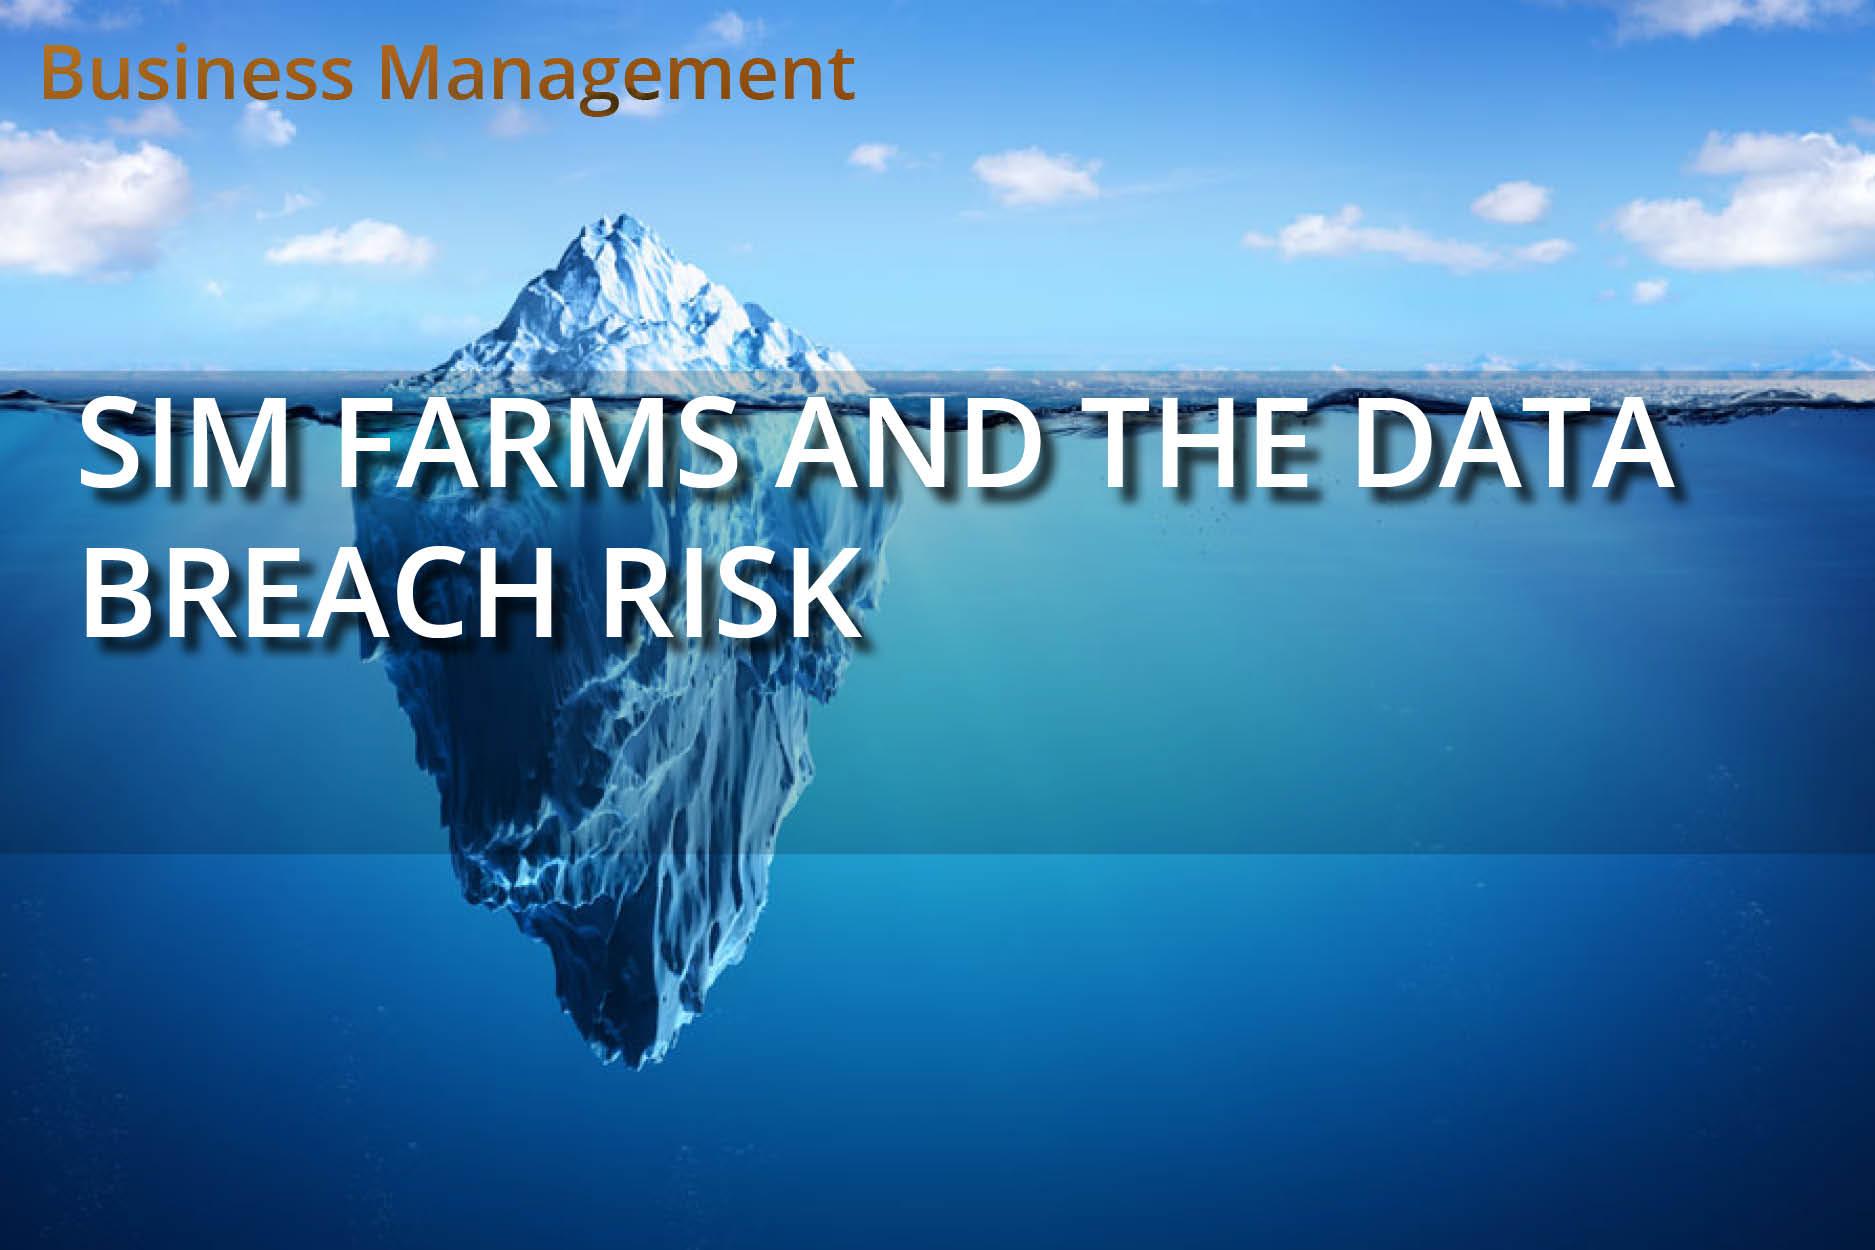 SIM Farms and the data breach risk